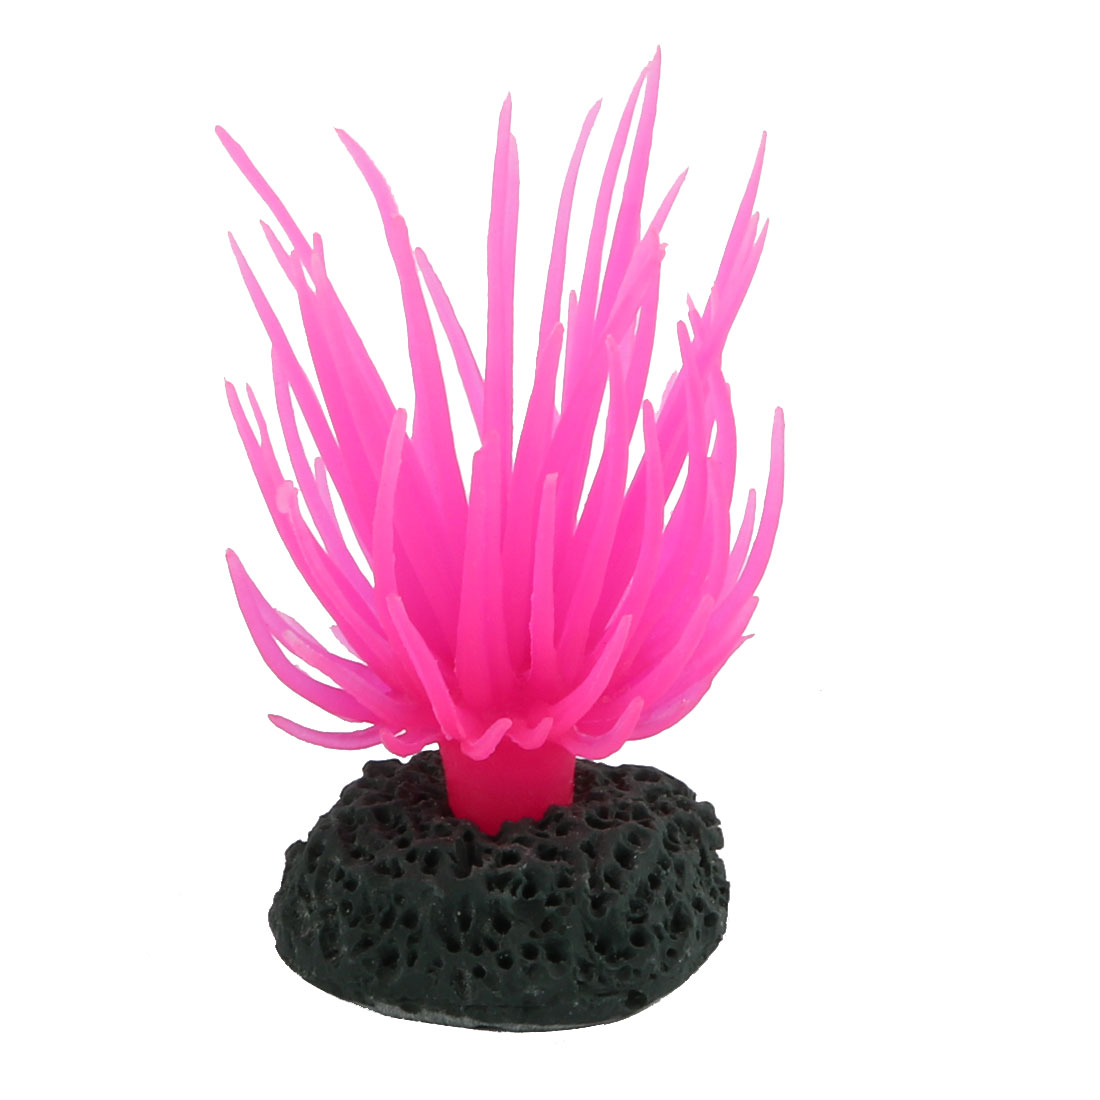 Aquarium Silicone Simulation Water Plant Landscape Coral Ornament Pink